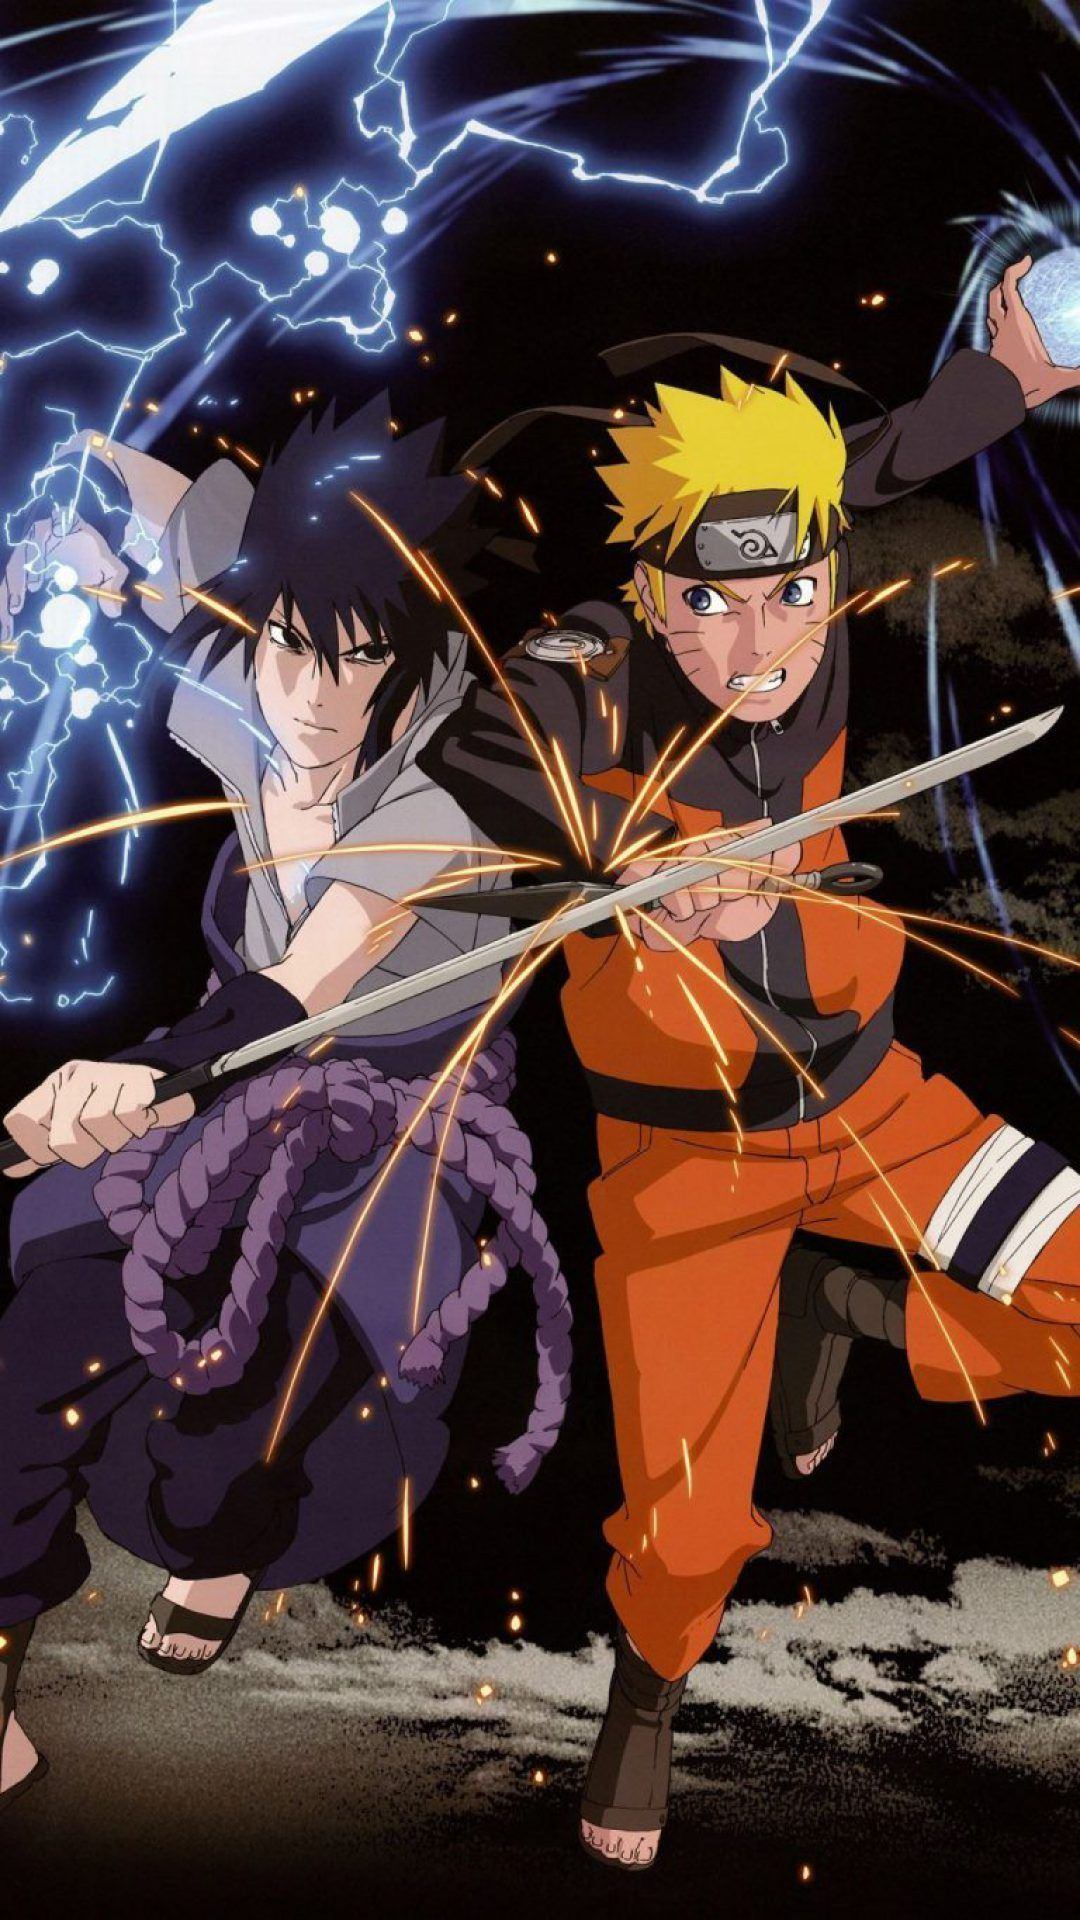 Naruto Vs Sasuke iPhone Wallpapers - Wallpaper Cave